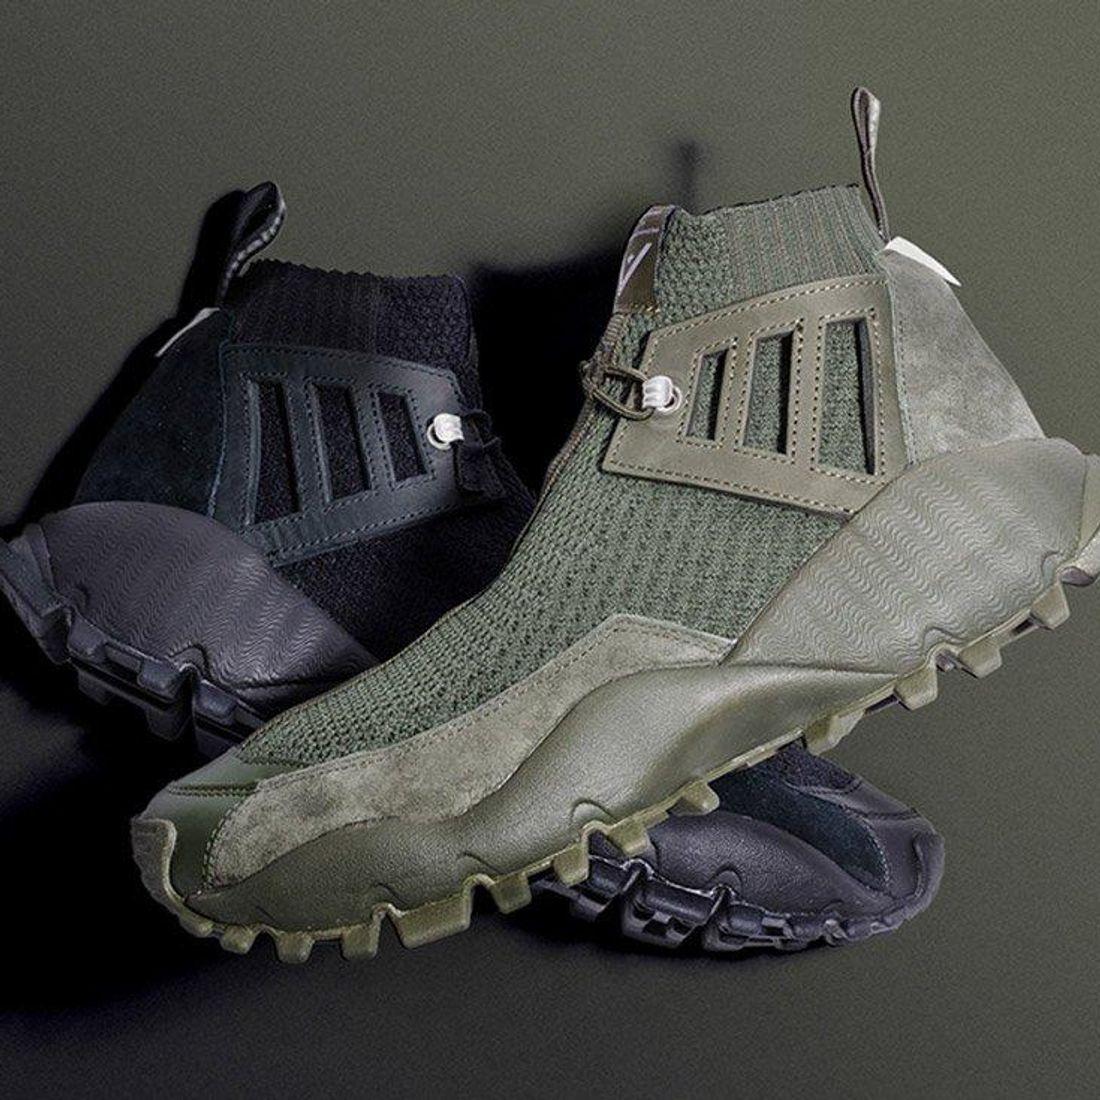 Carretilla Embotellamiento corazón perdido  White Mountaineering X Adidas Seeulater Alledo PK - Sneaker Freaker